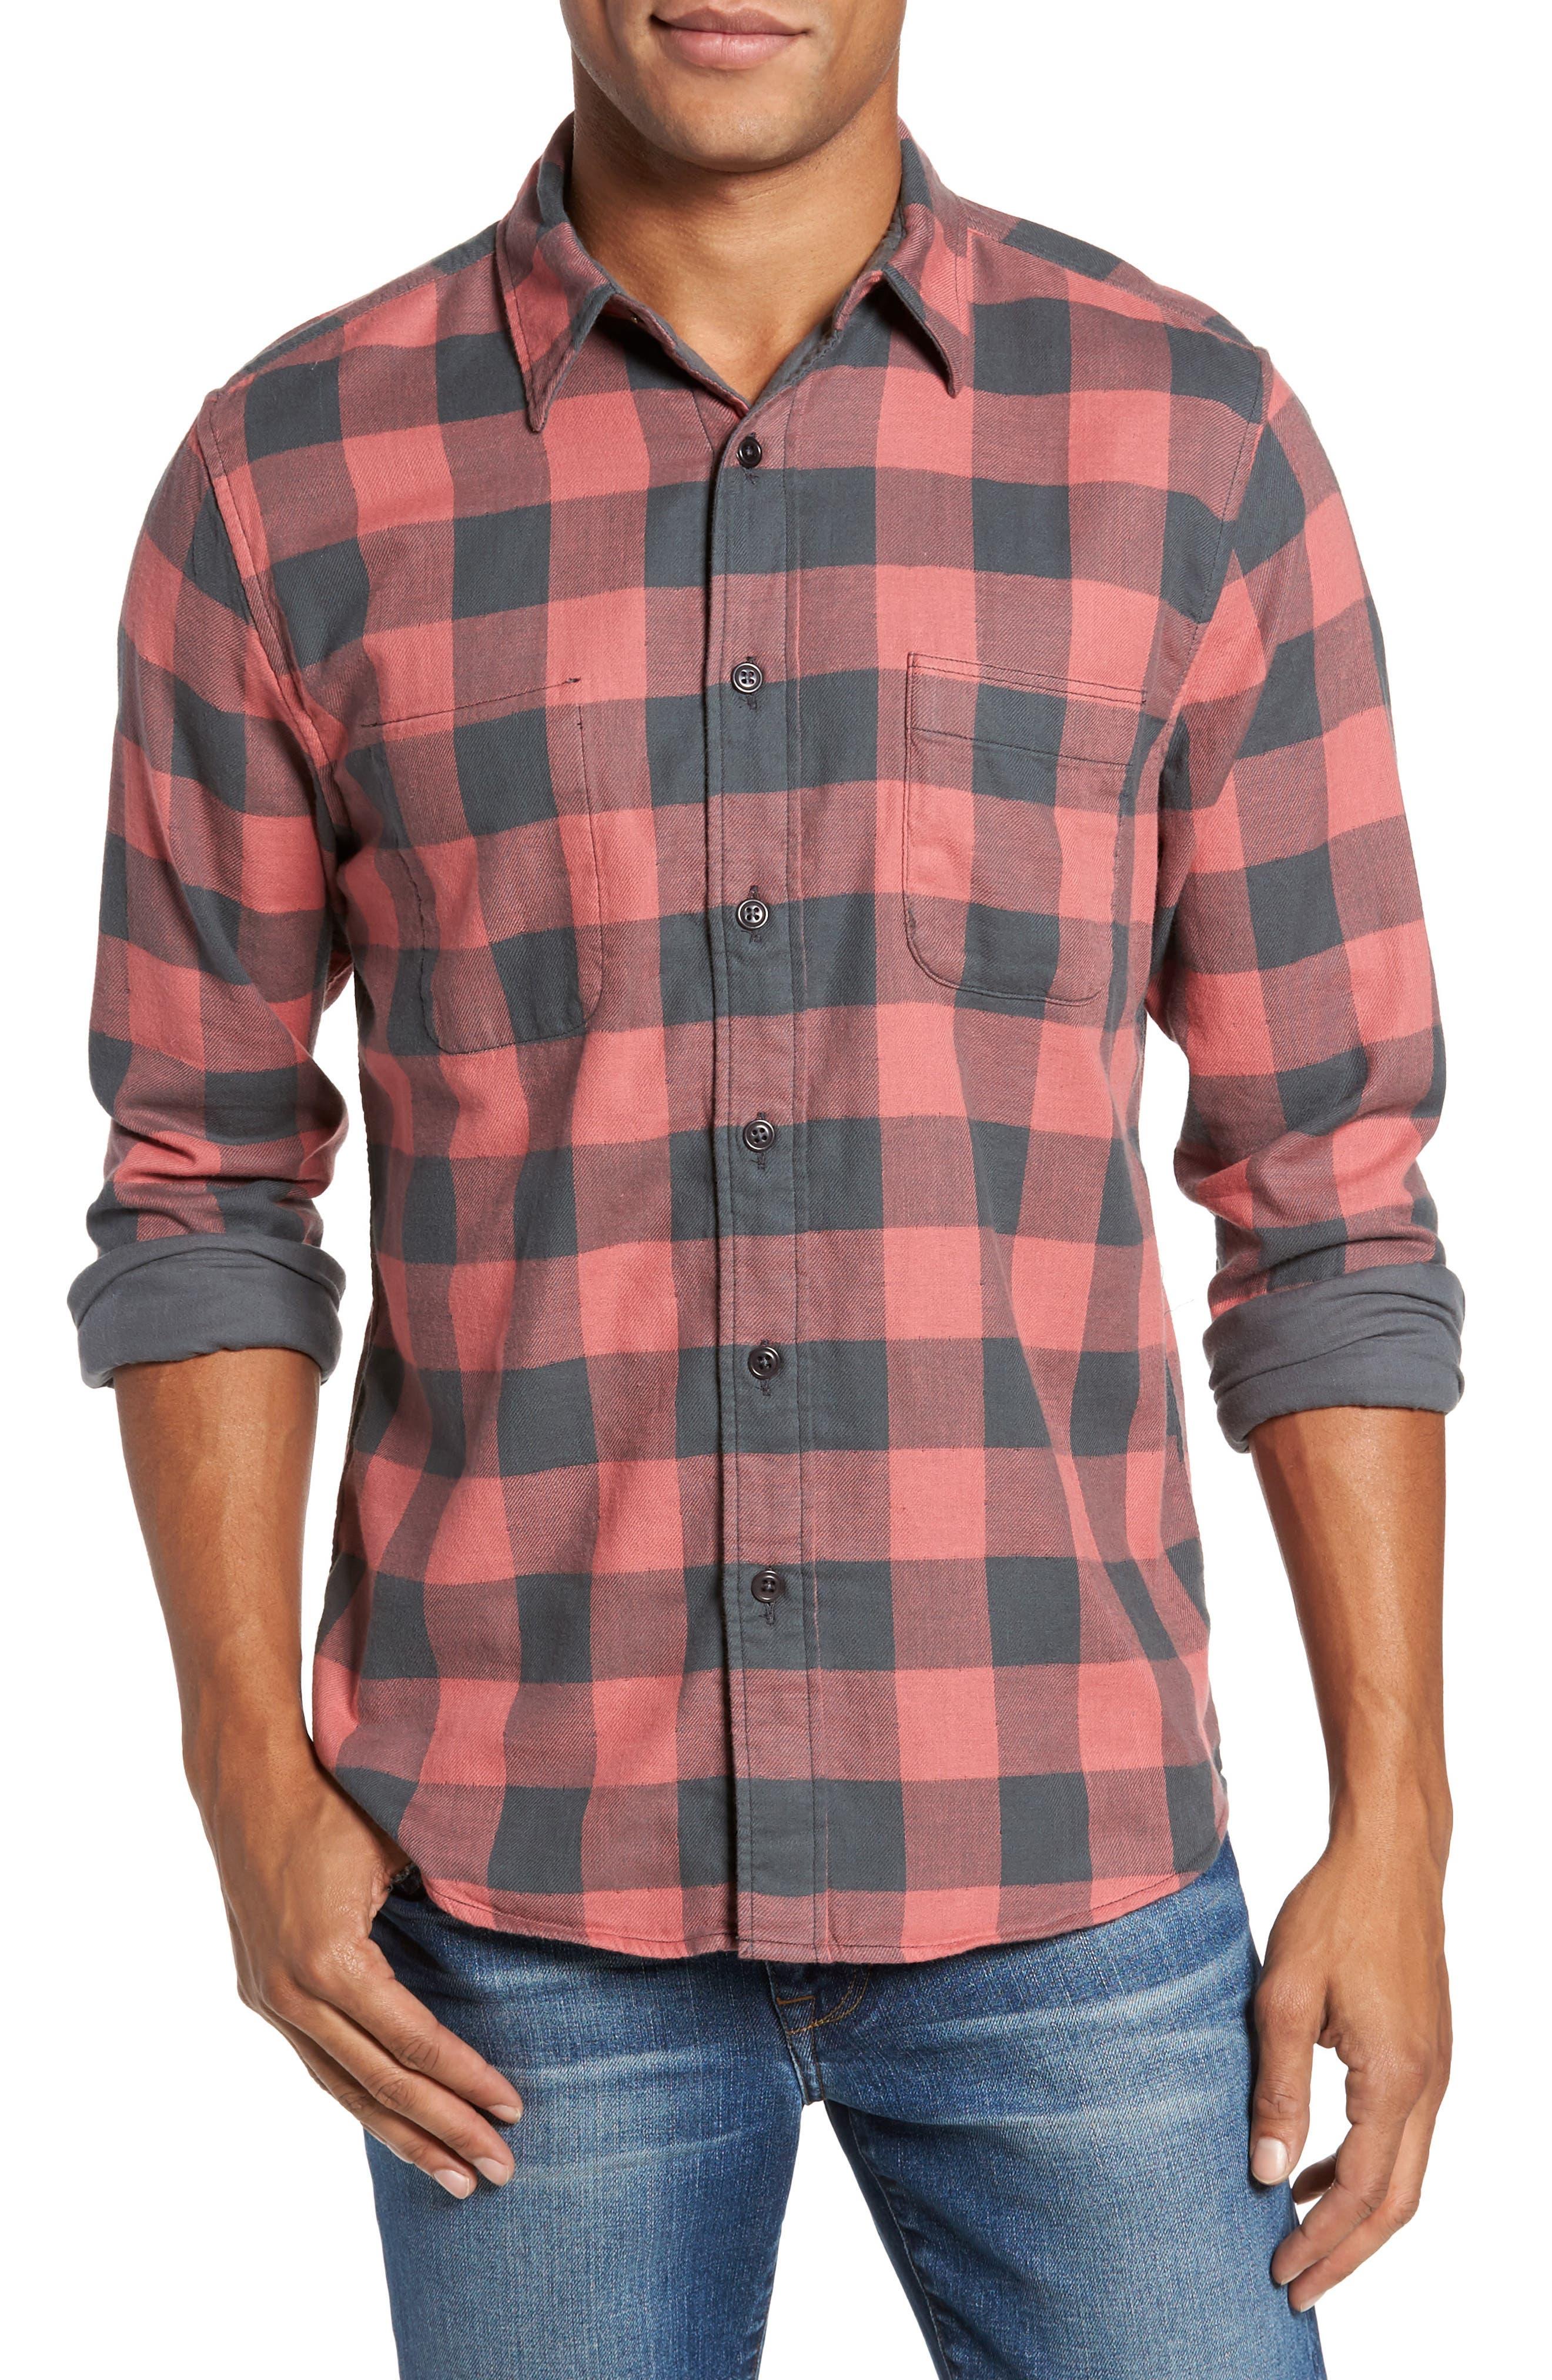 Belmar Trim Fit Long Sleeve Reversible Sport Shirt,                             Main thumbnail 1, color,                             Grey / Red Buffalo Check